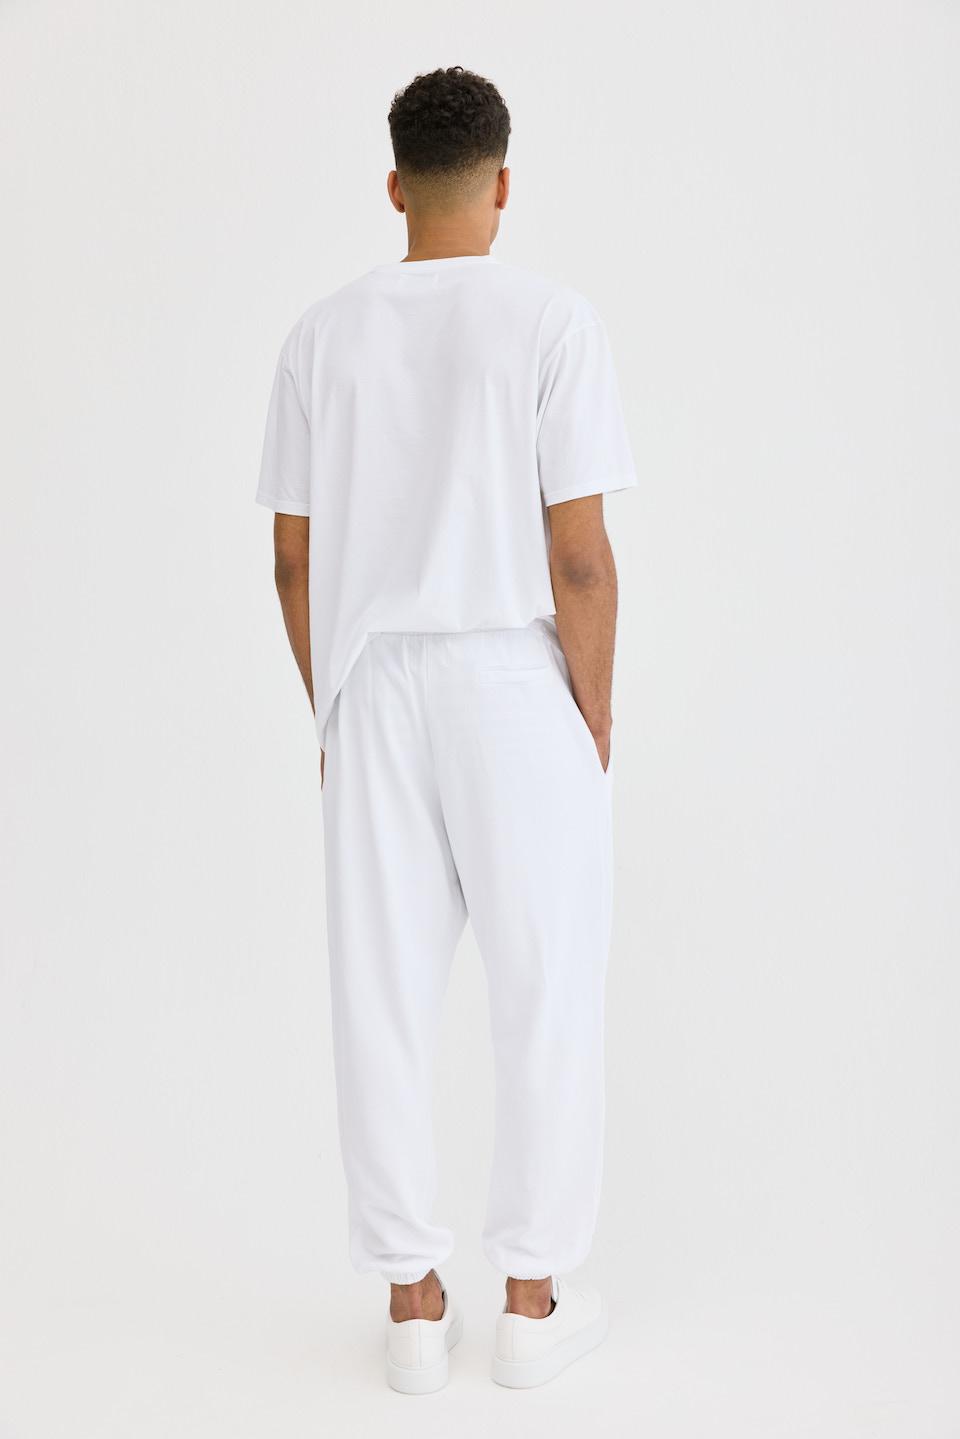 CPH Sweatpants 1M org. cotton white - alternative 1